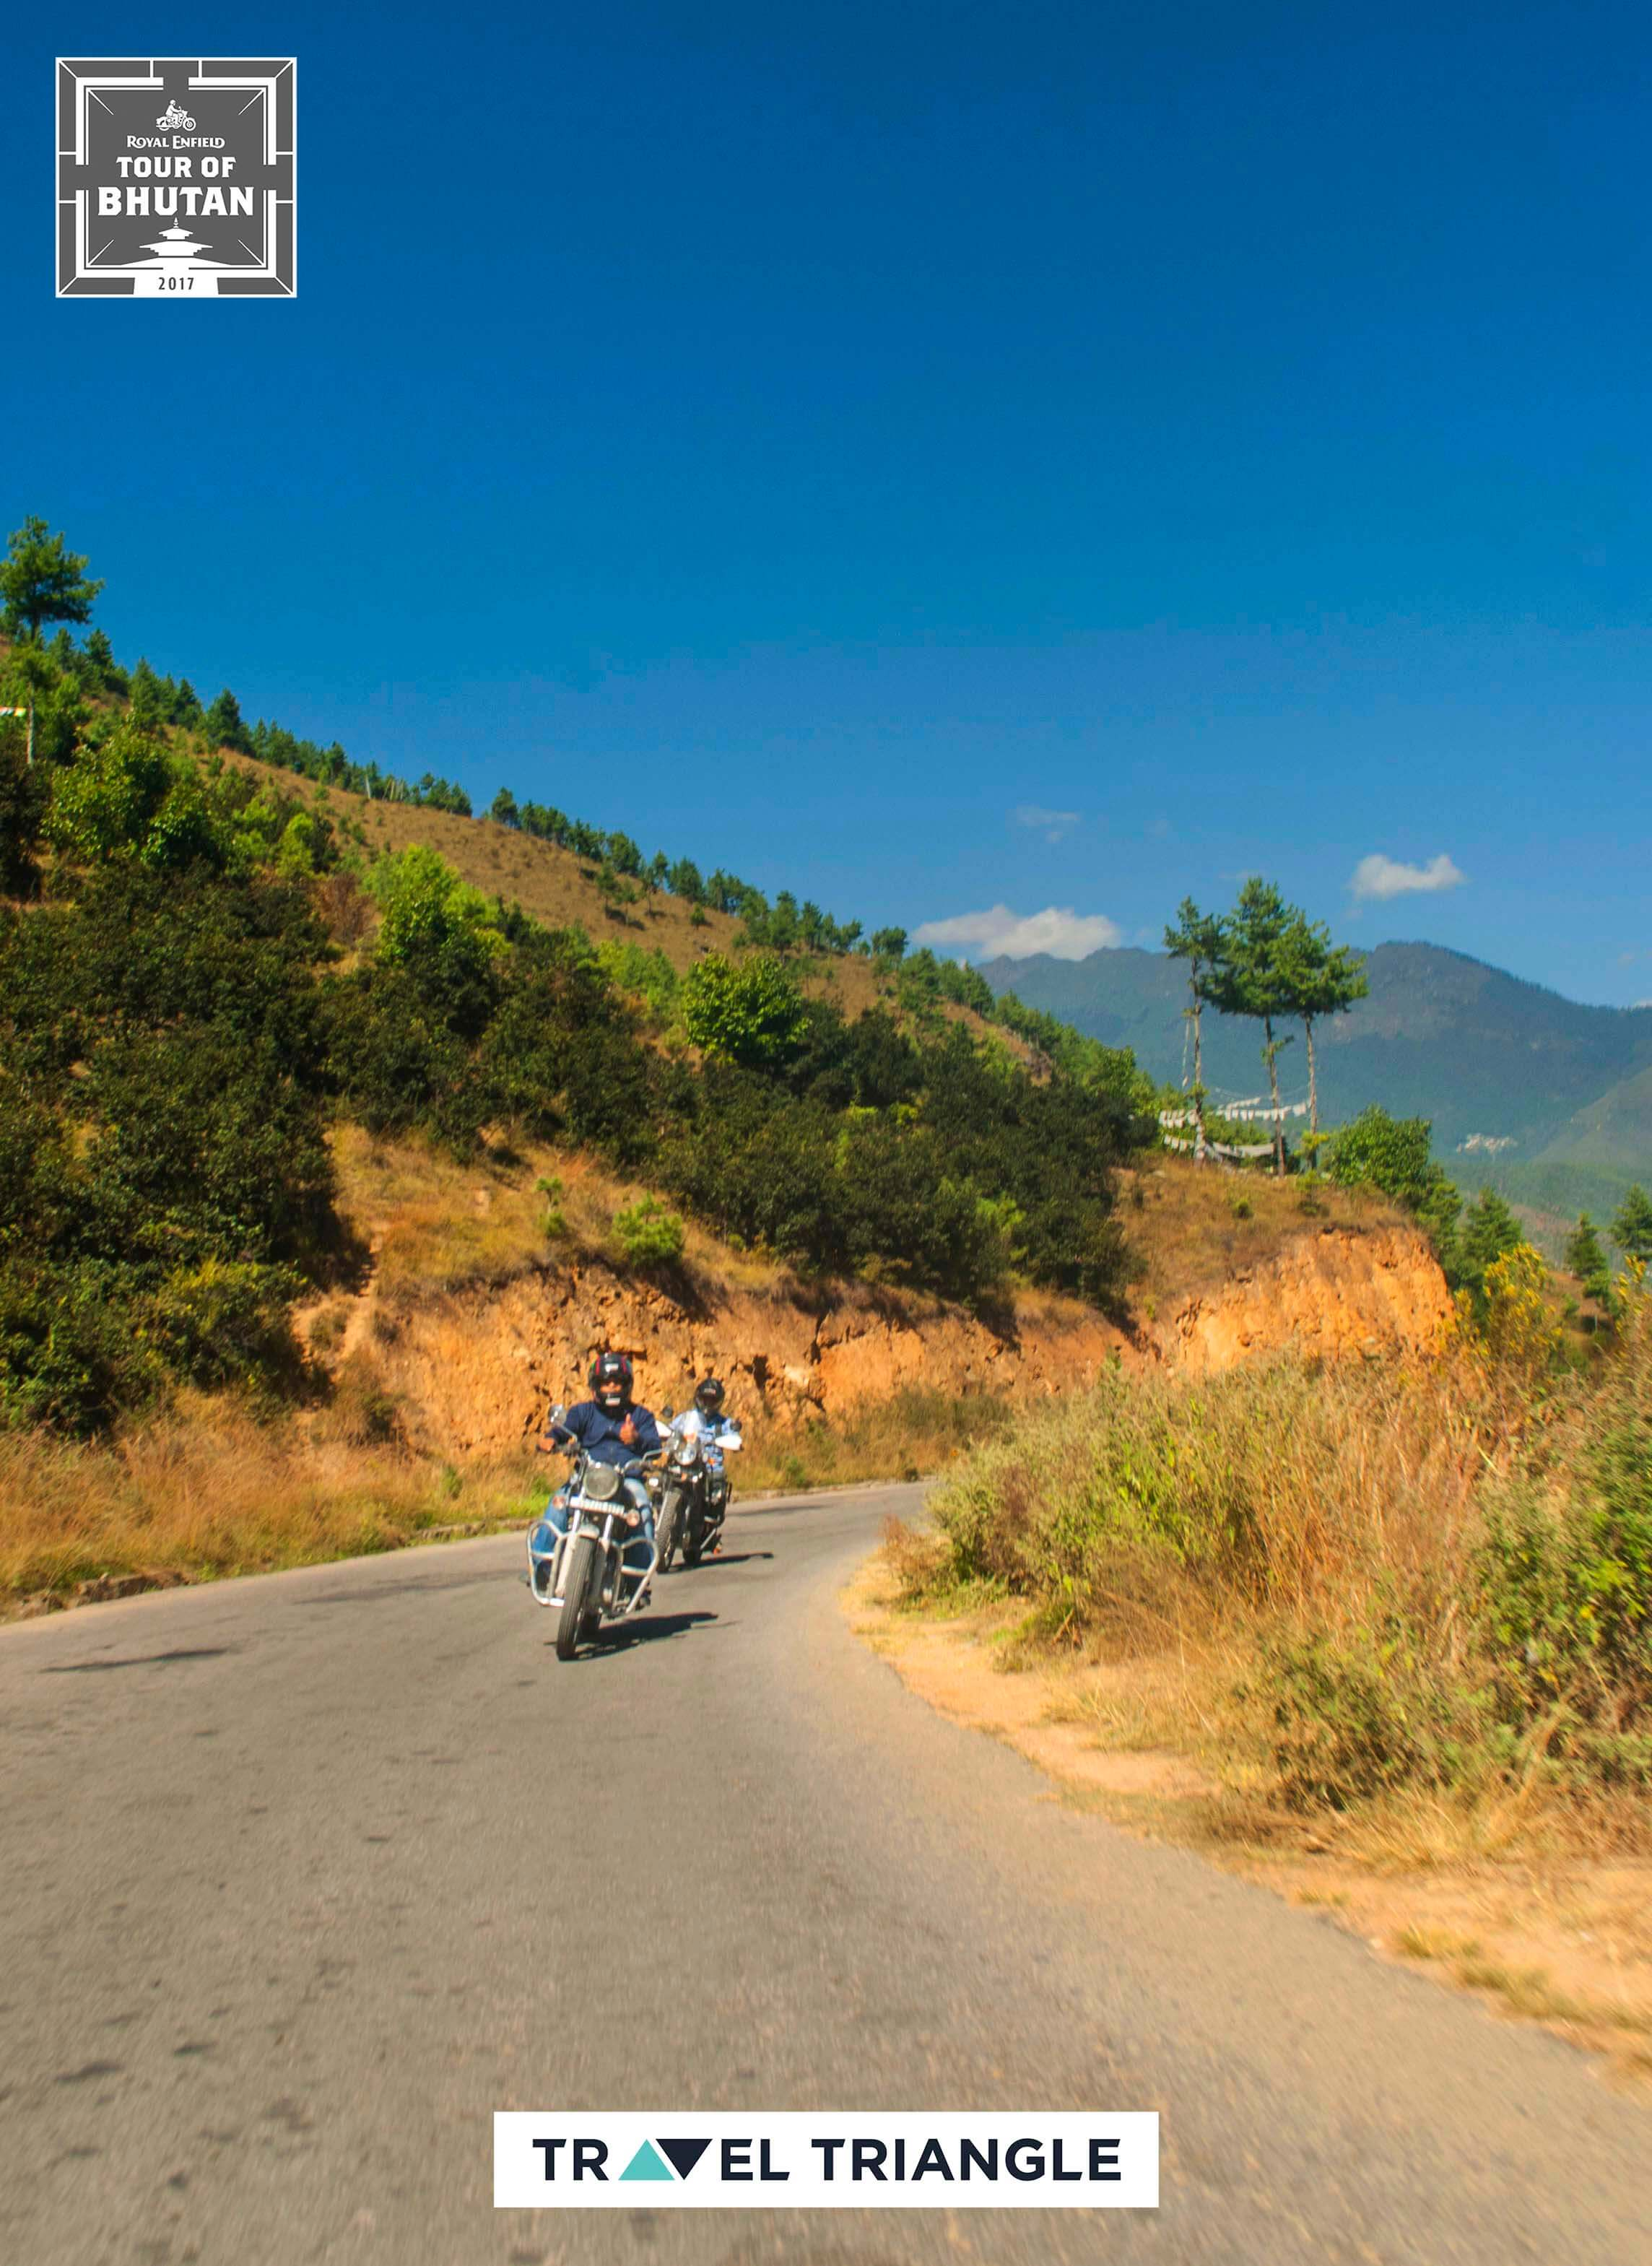 Thimphu: Exploring the capital city of Bhutan 3